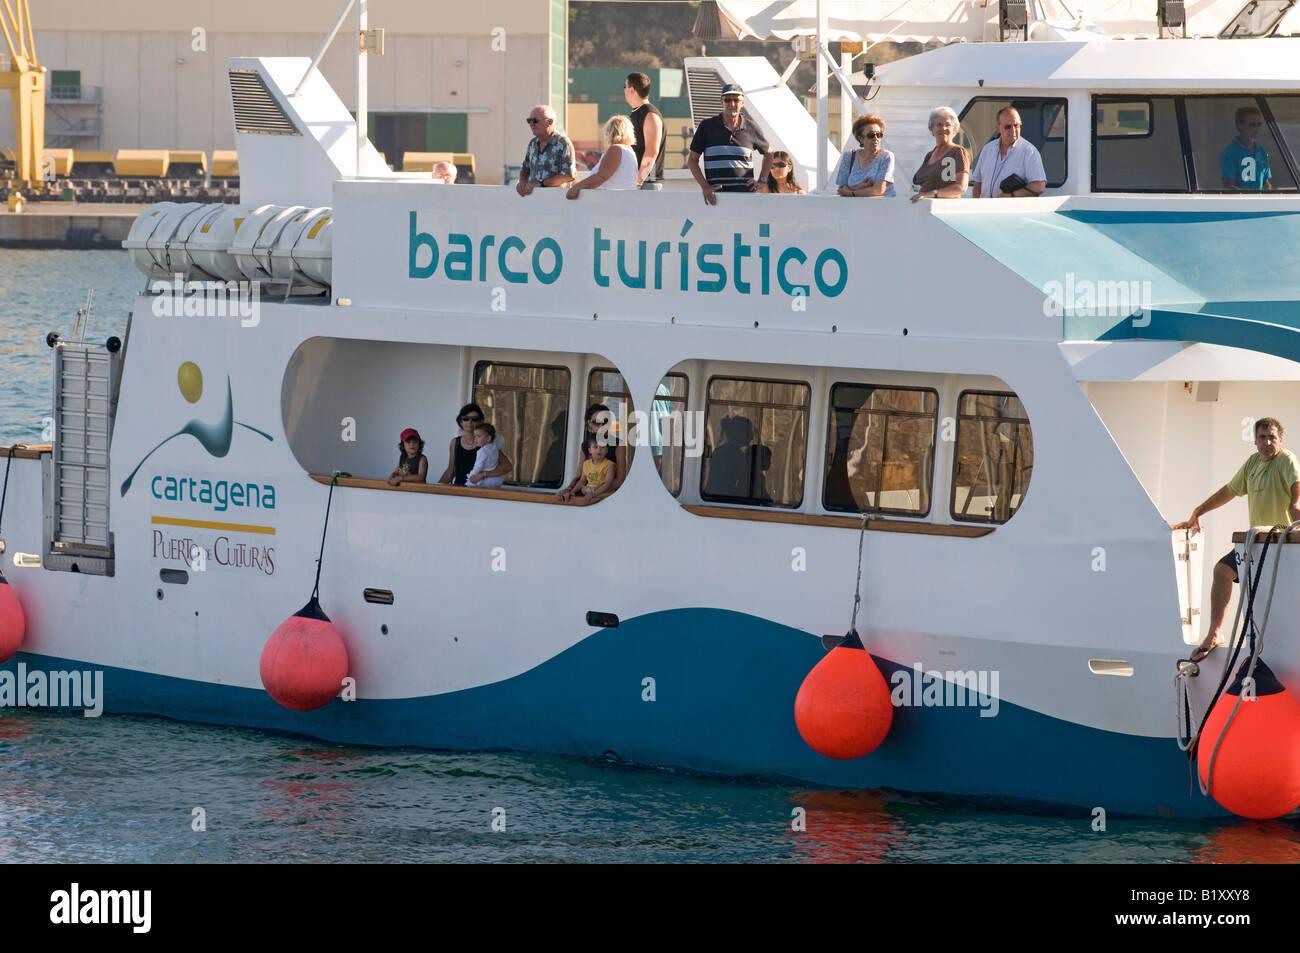 Tourist Boat (Barco Turistico) at Cartagena, Murcia, Spain Stock Photo